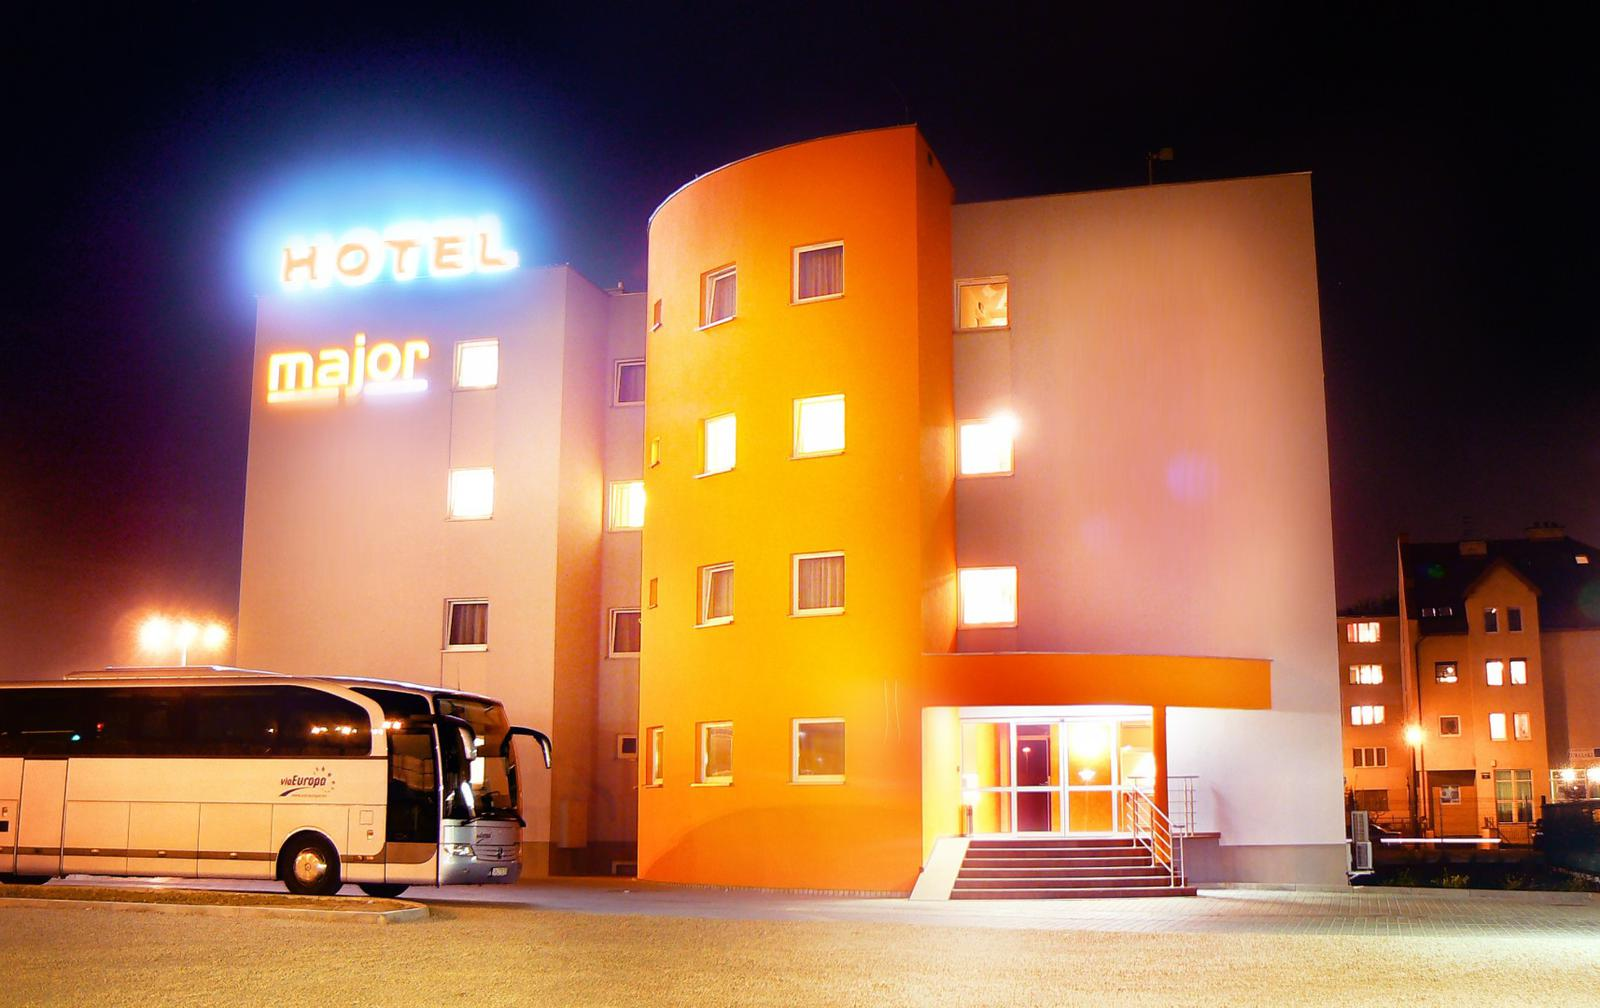 Hotel Major am Abend